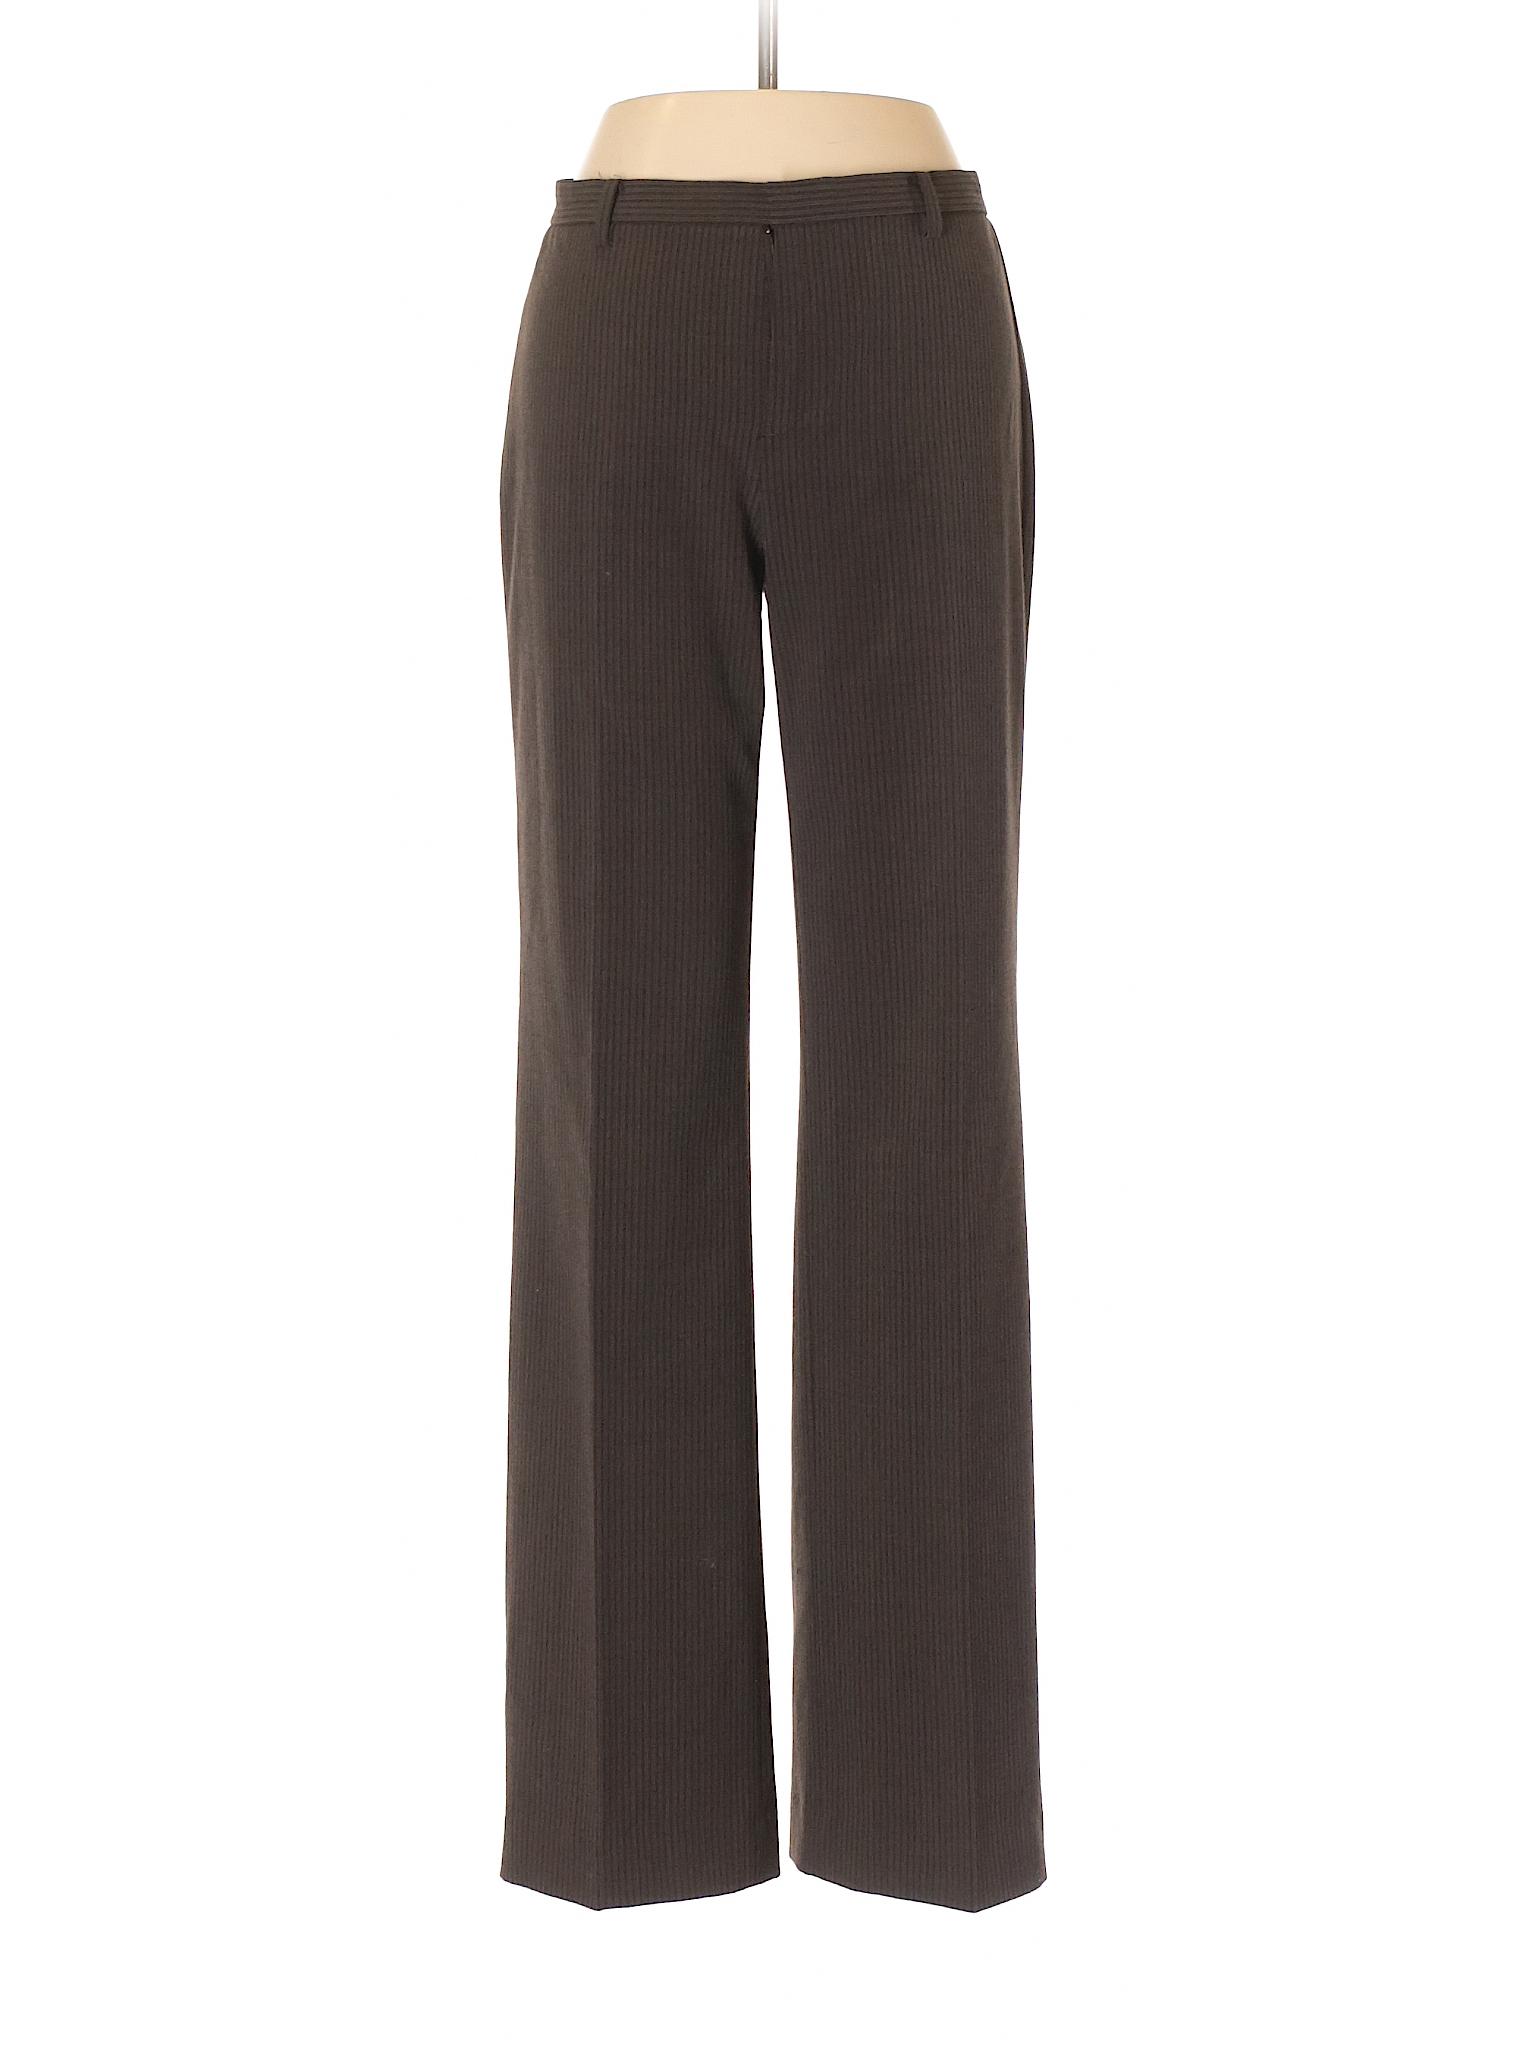 Gap Dress leisure Pants Gap leisure Gap Boutique Boutique Boutique Pants Dress leisure WRqw7F